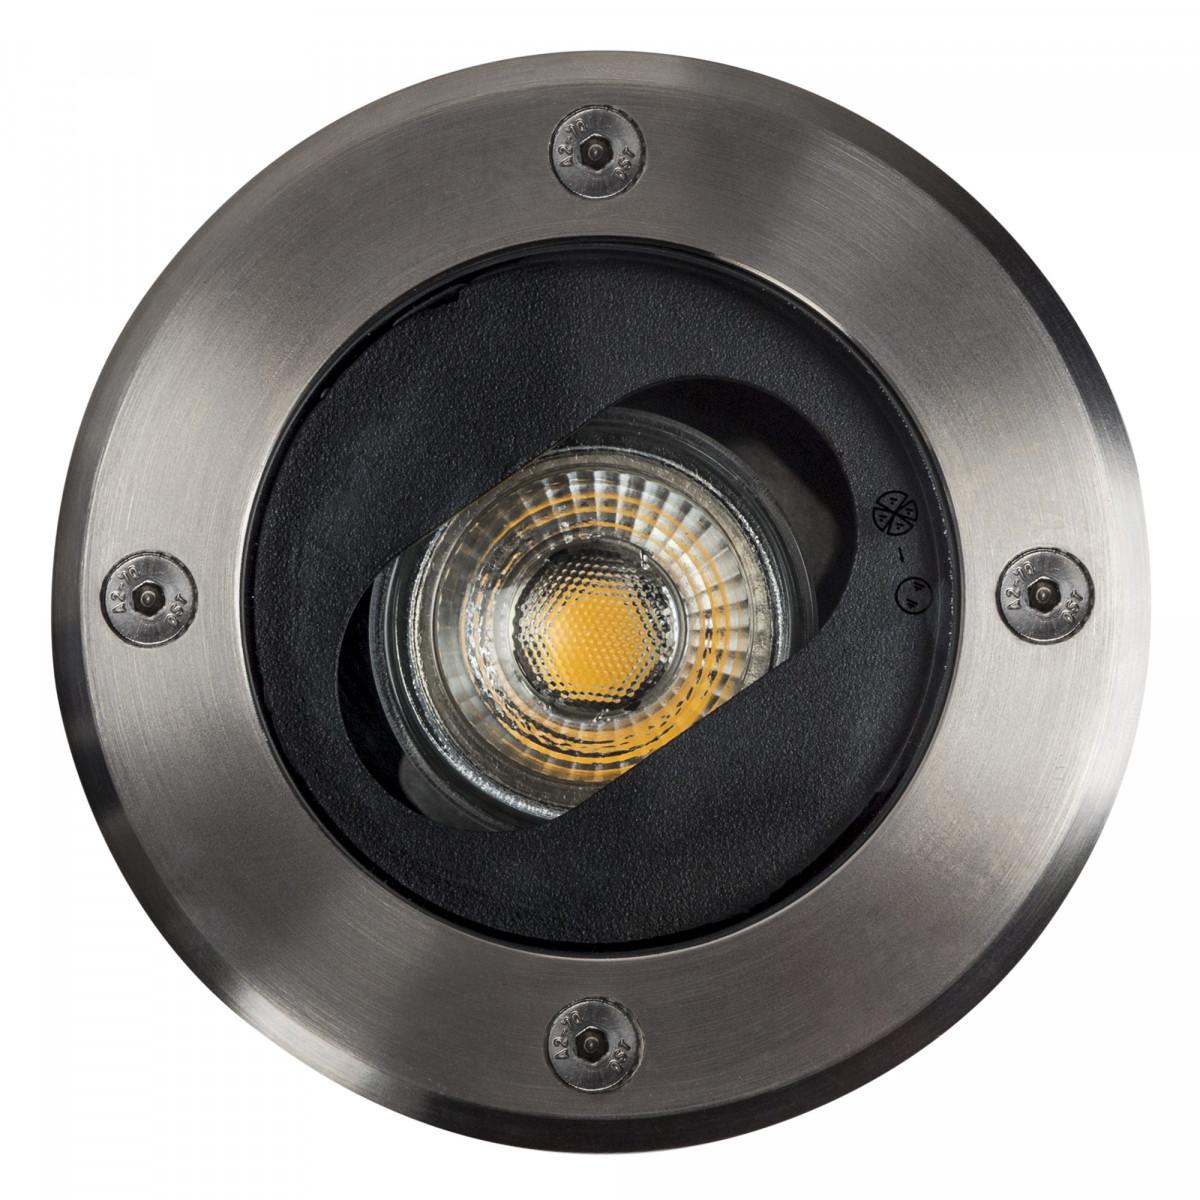 RVS Bodenspot Unit einschließlich GU10 LED